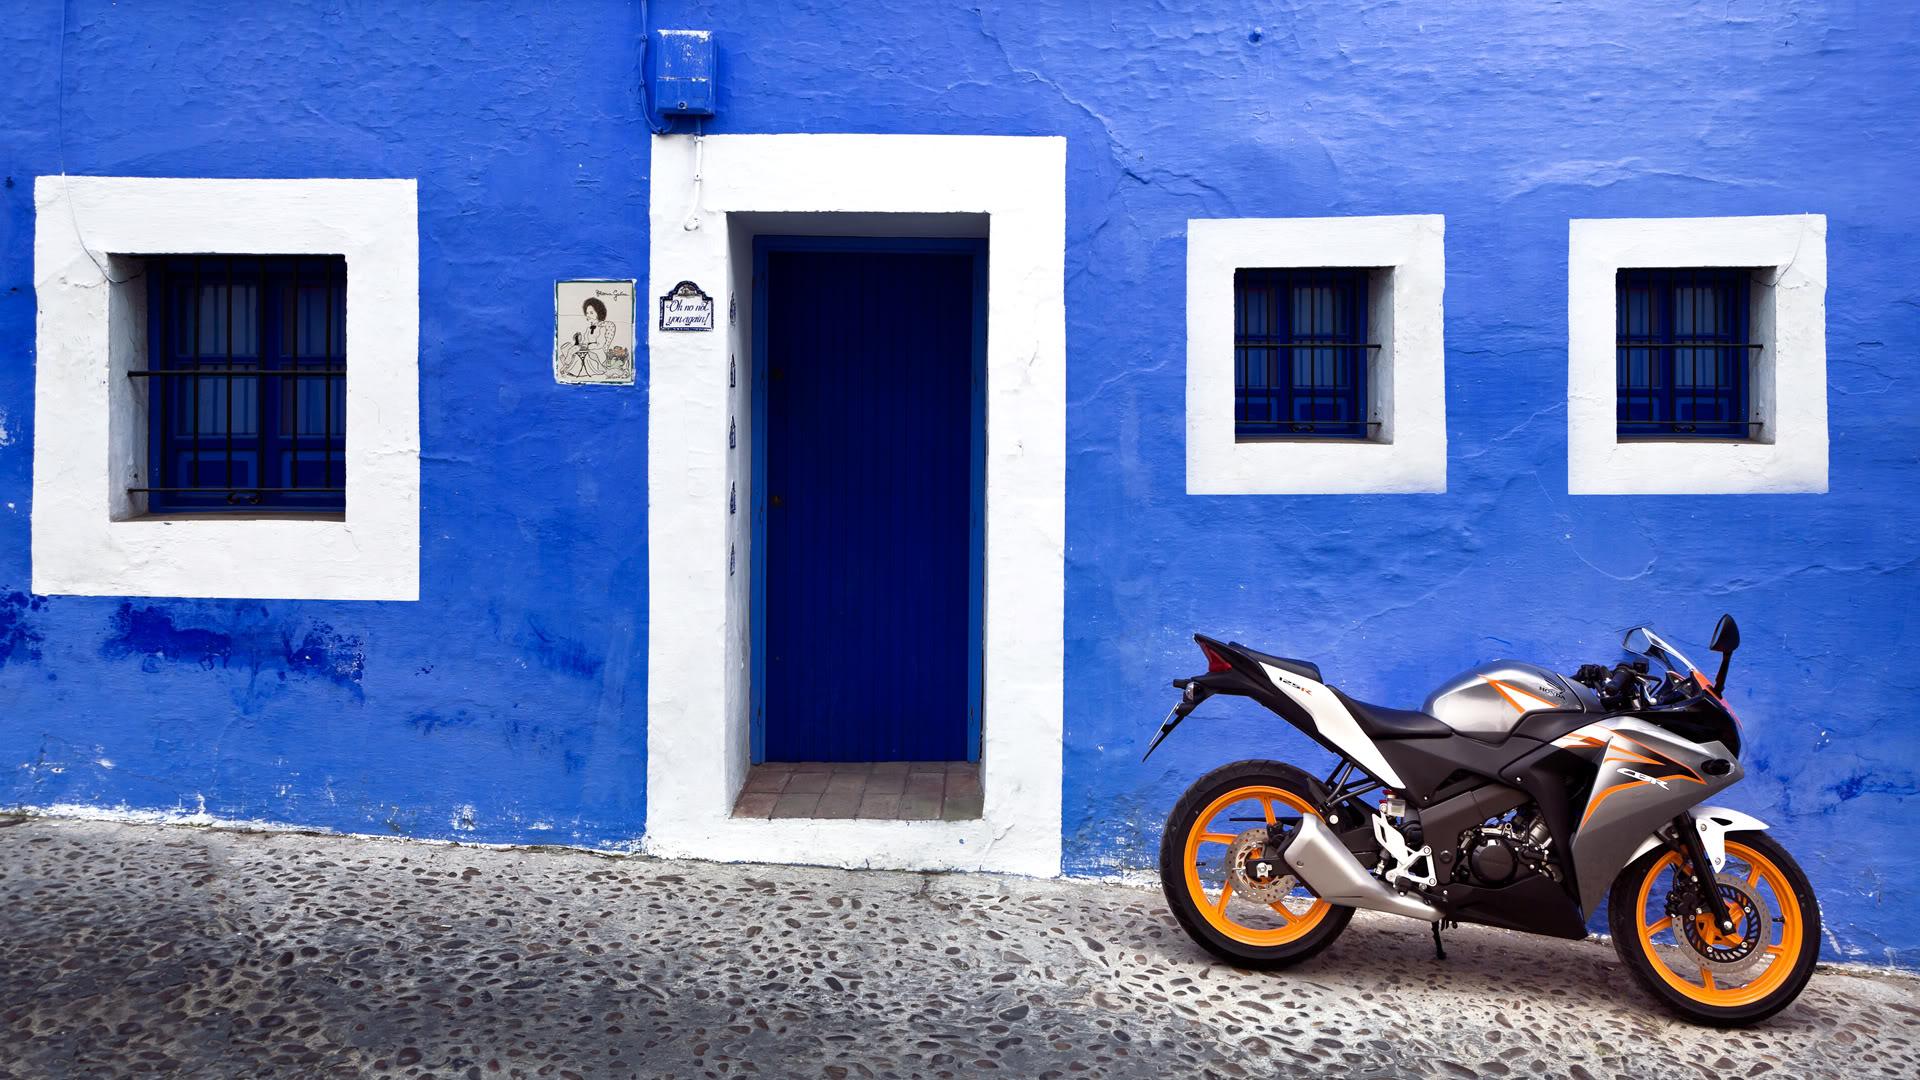 Honda Motorcycle Cbr R Andalusia Hd 438272 Wallpaper wallpaper